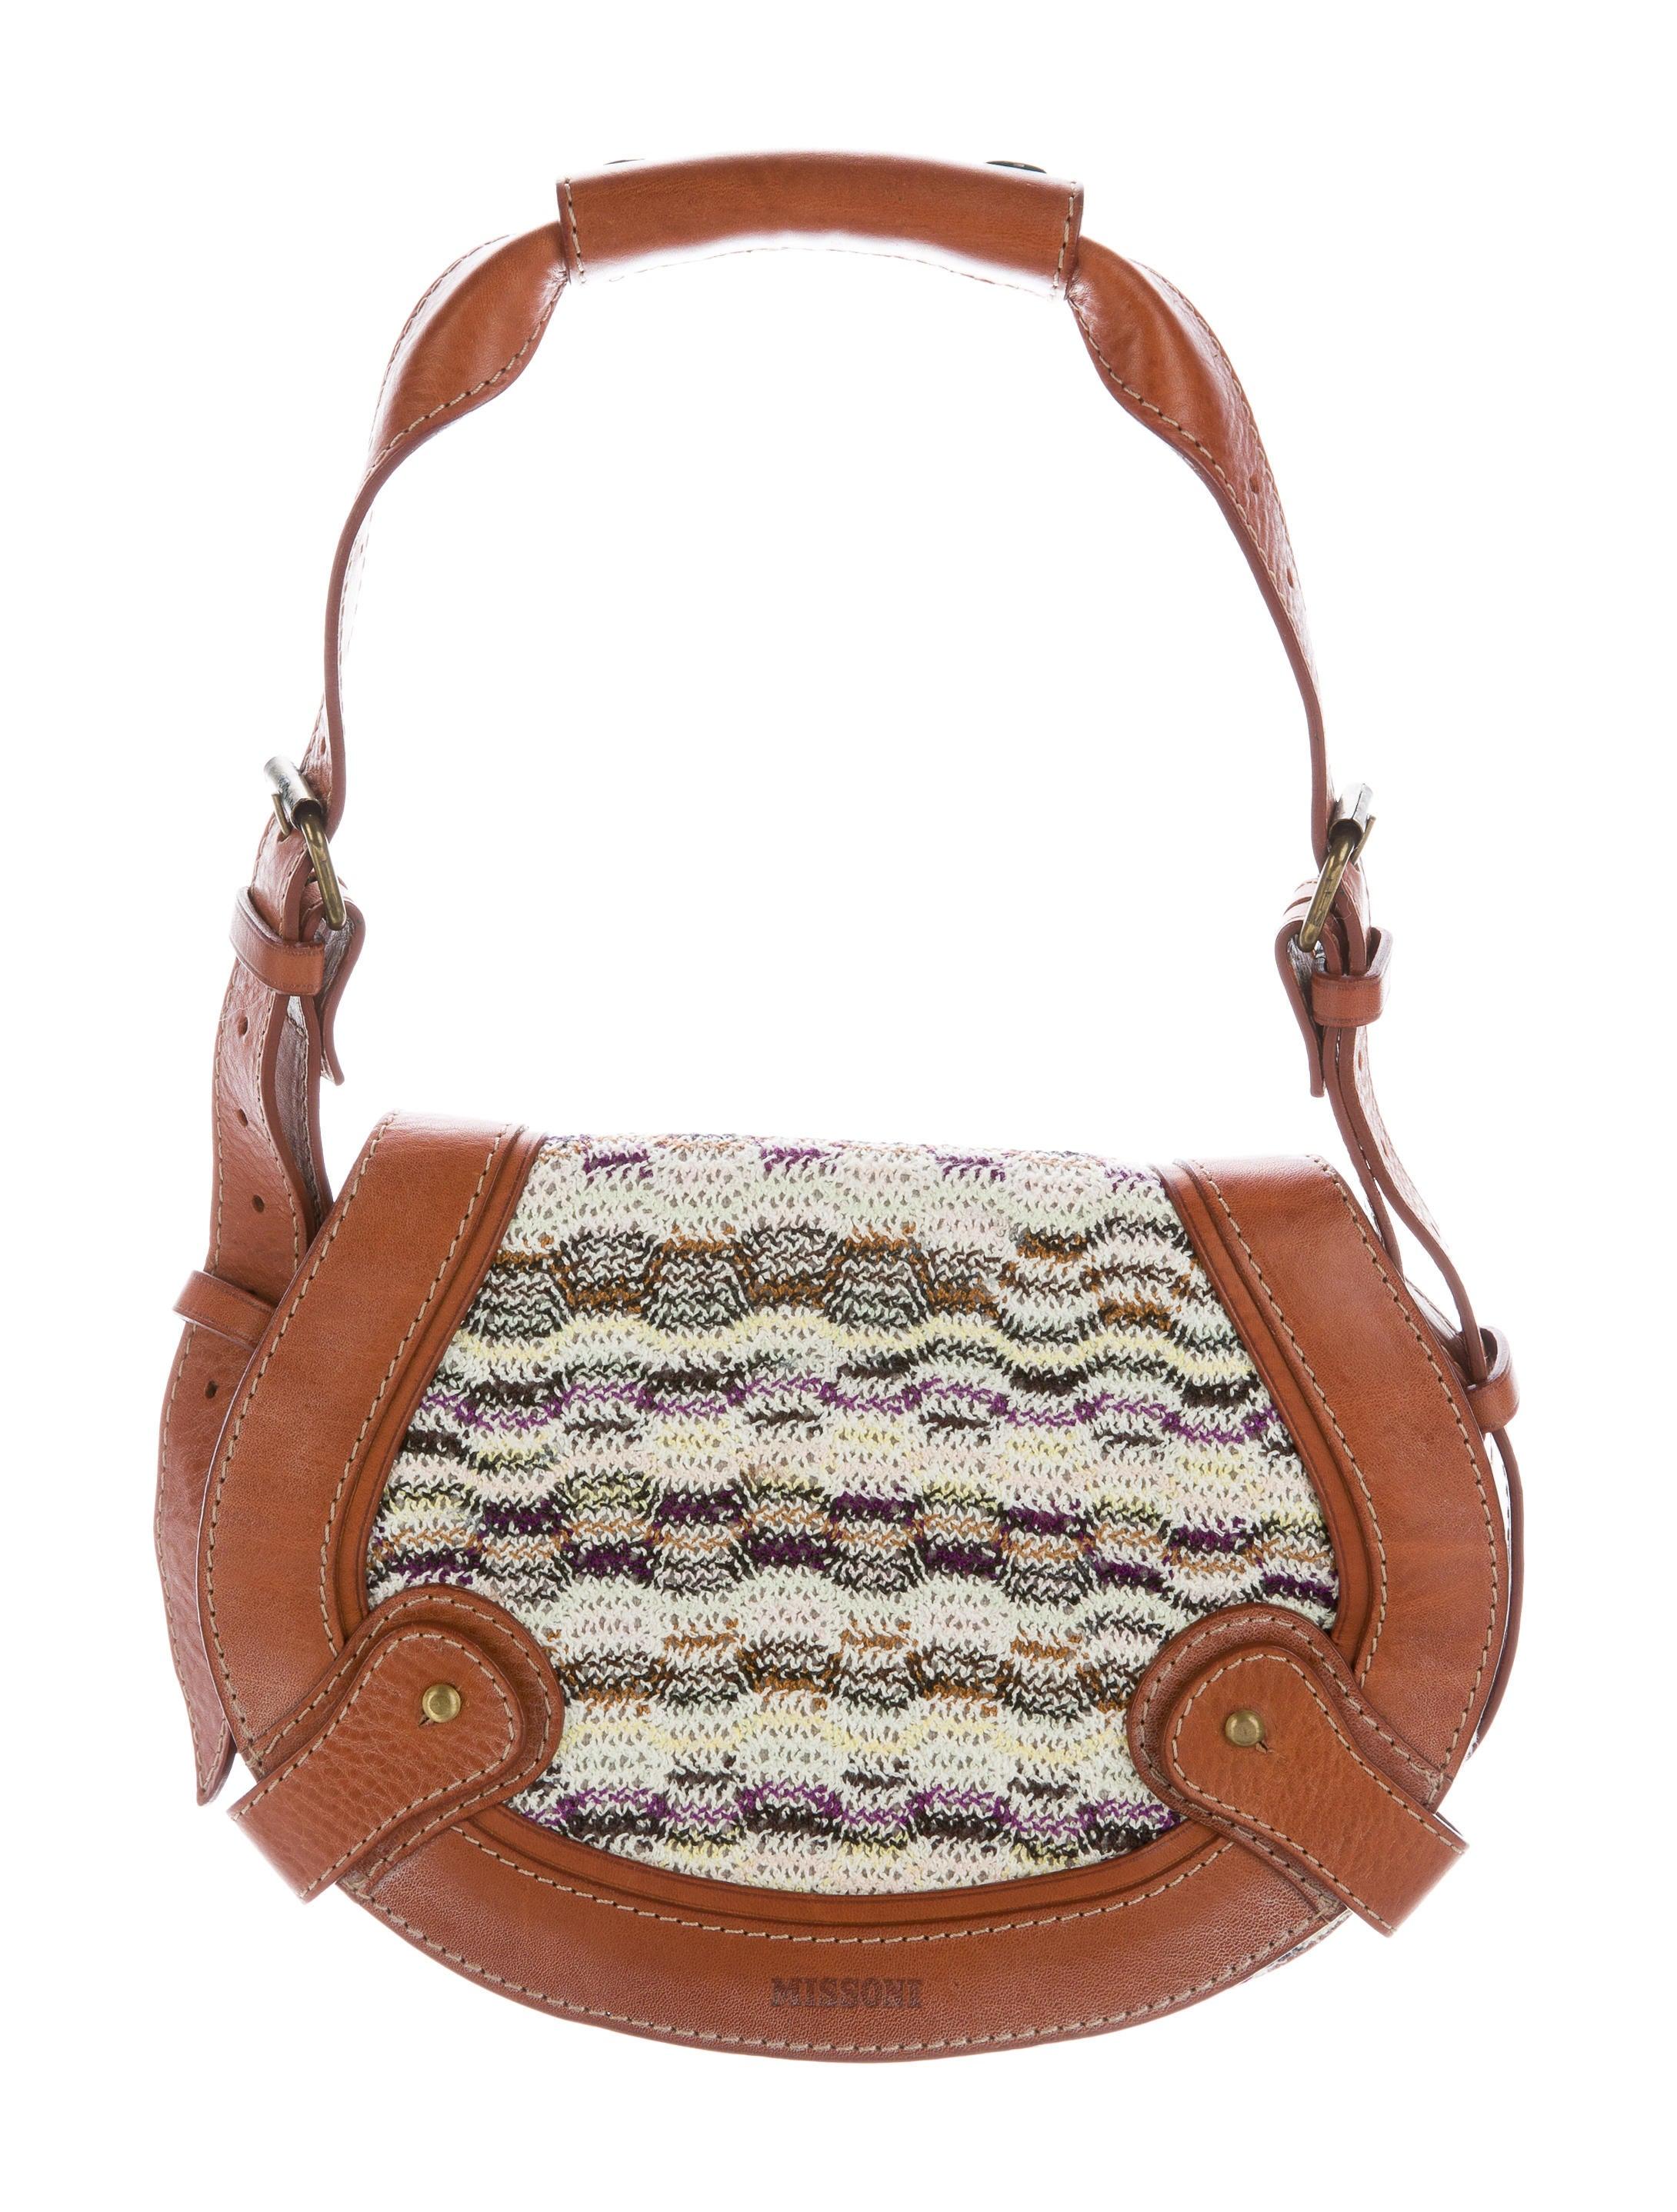 Missoni Leather-Trimmed Knit Bag - Handbags